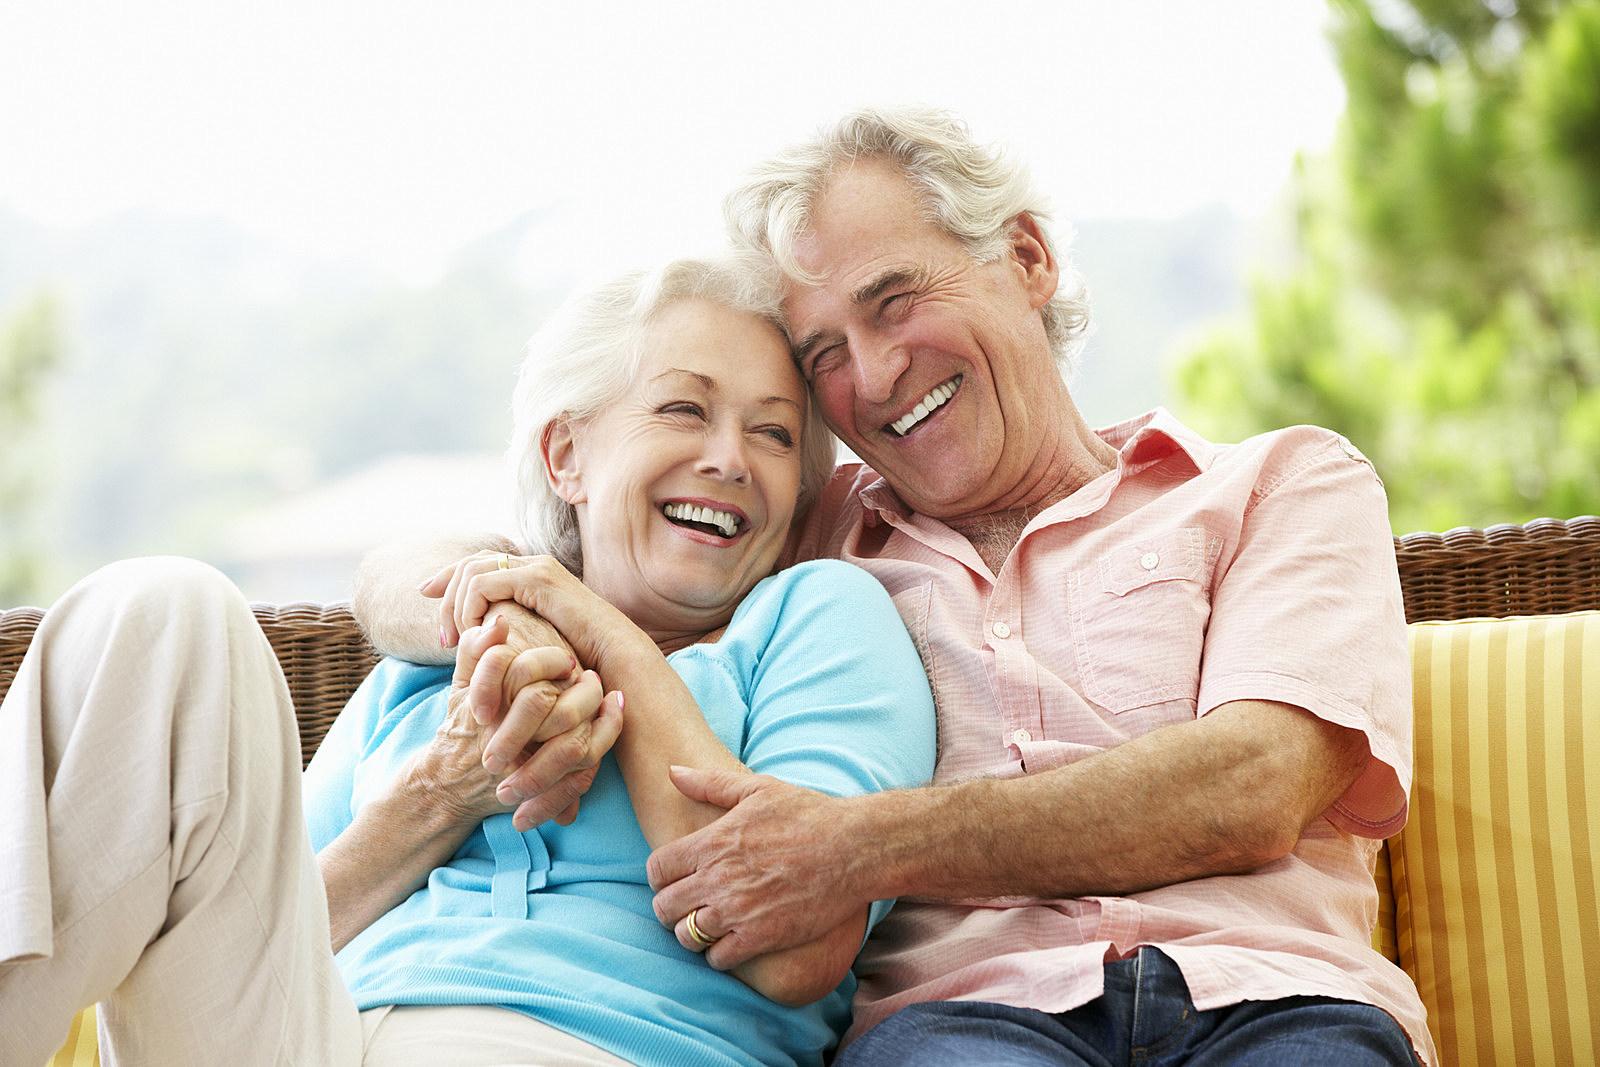 Senior adult lifestyles